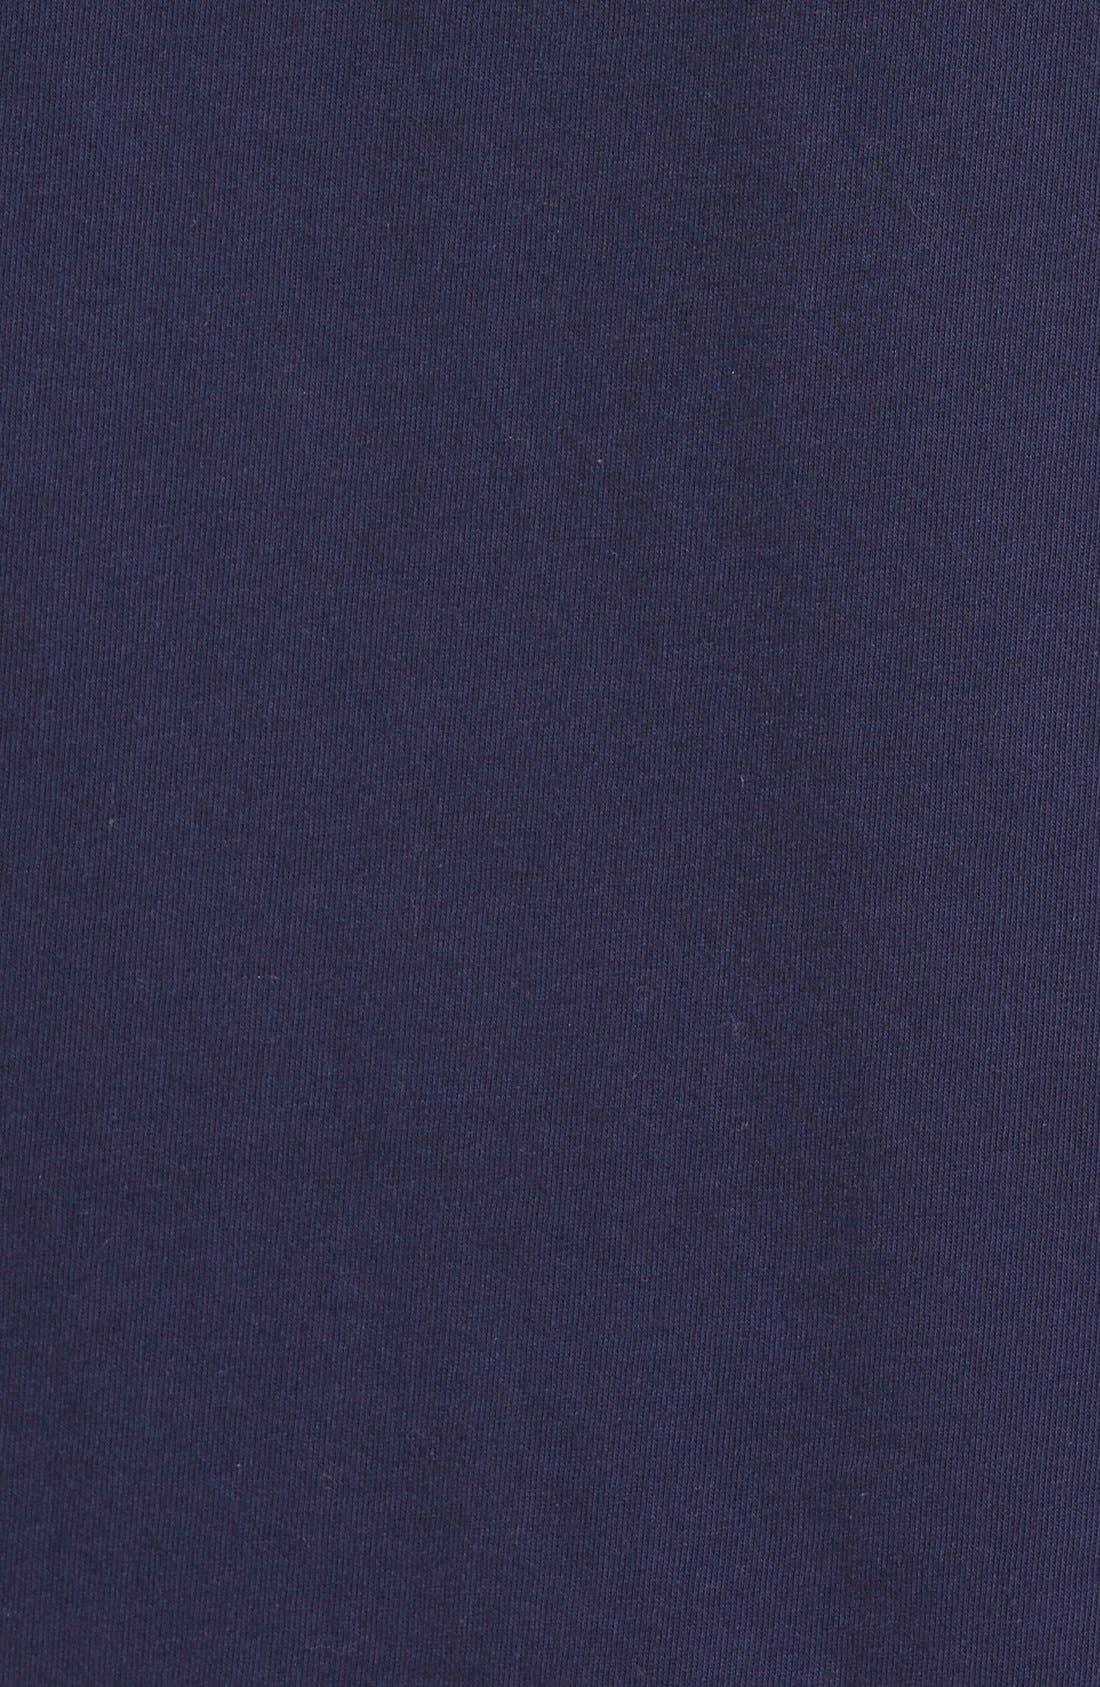 Alternate Image 3  - Vineyard Vines 'Whale Tail' Pocket Tee